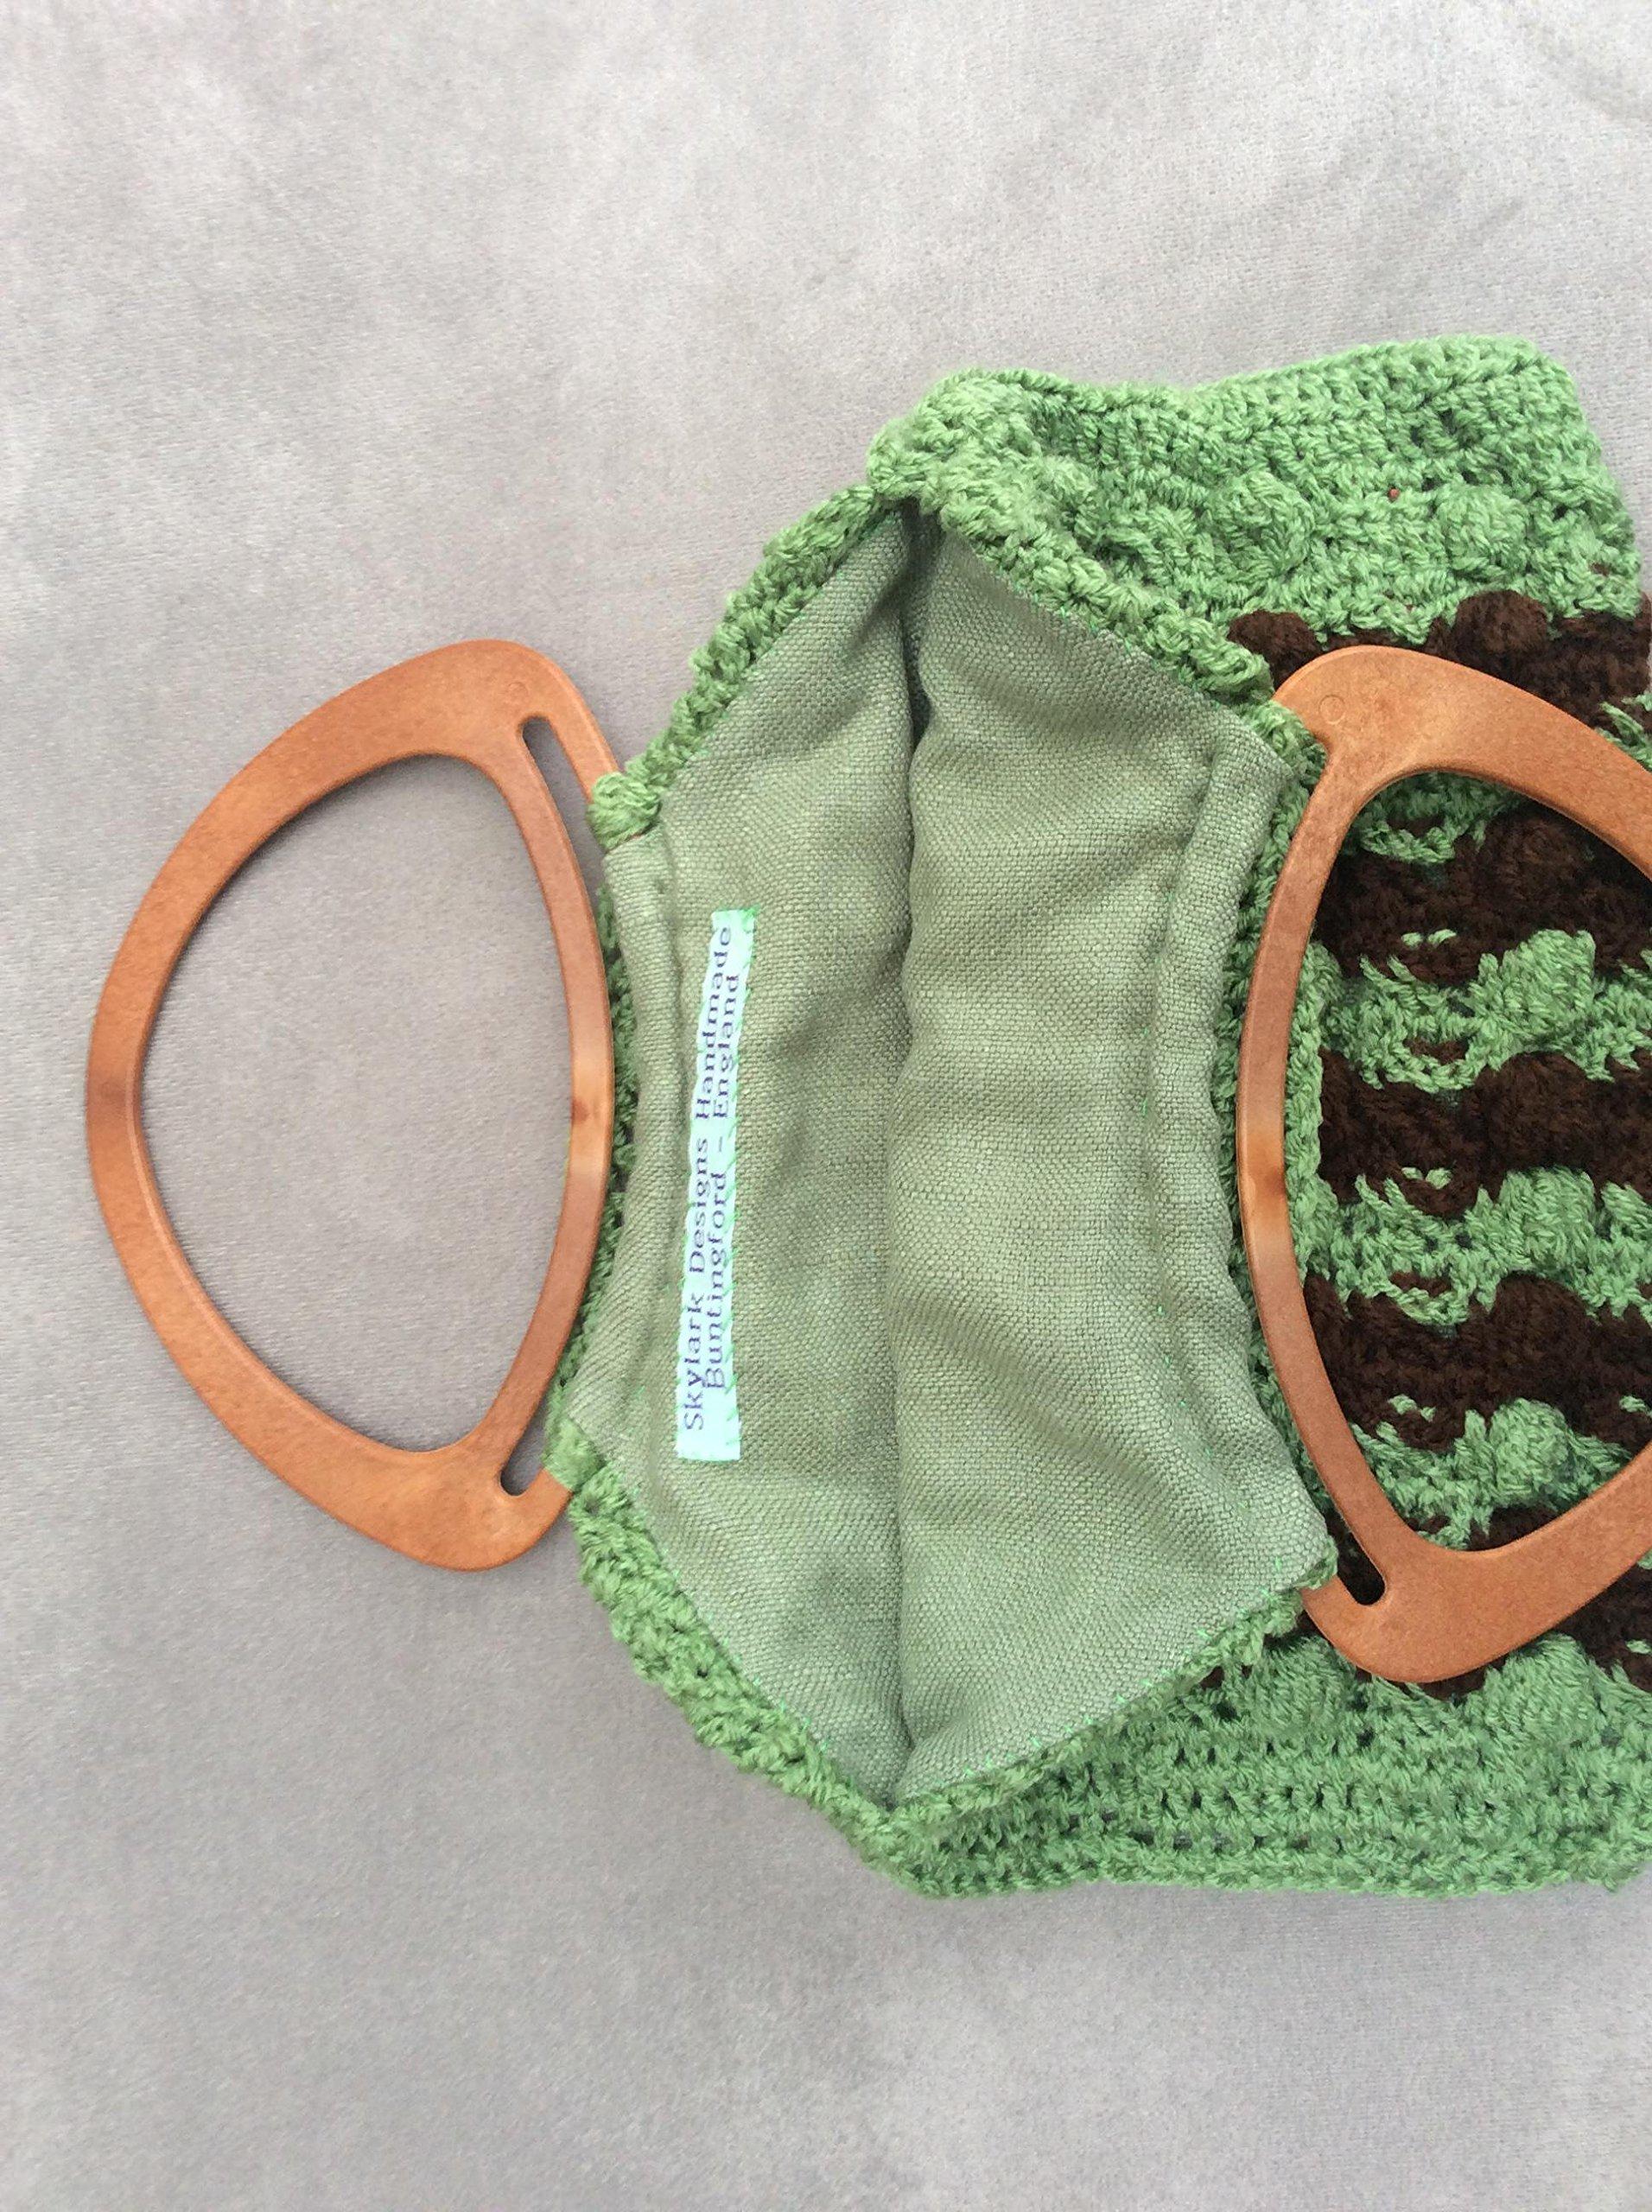 Bobble Stitch Crochet Handbag Lined Green and Brown - handmade-bags